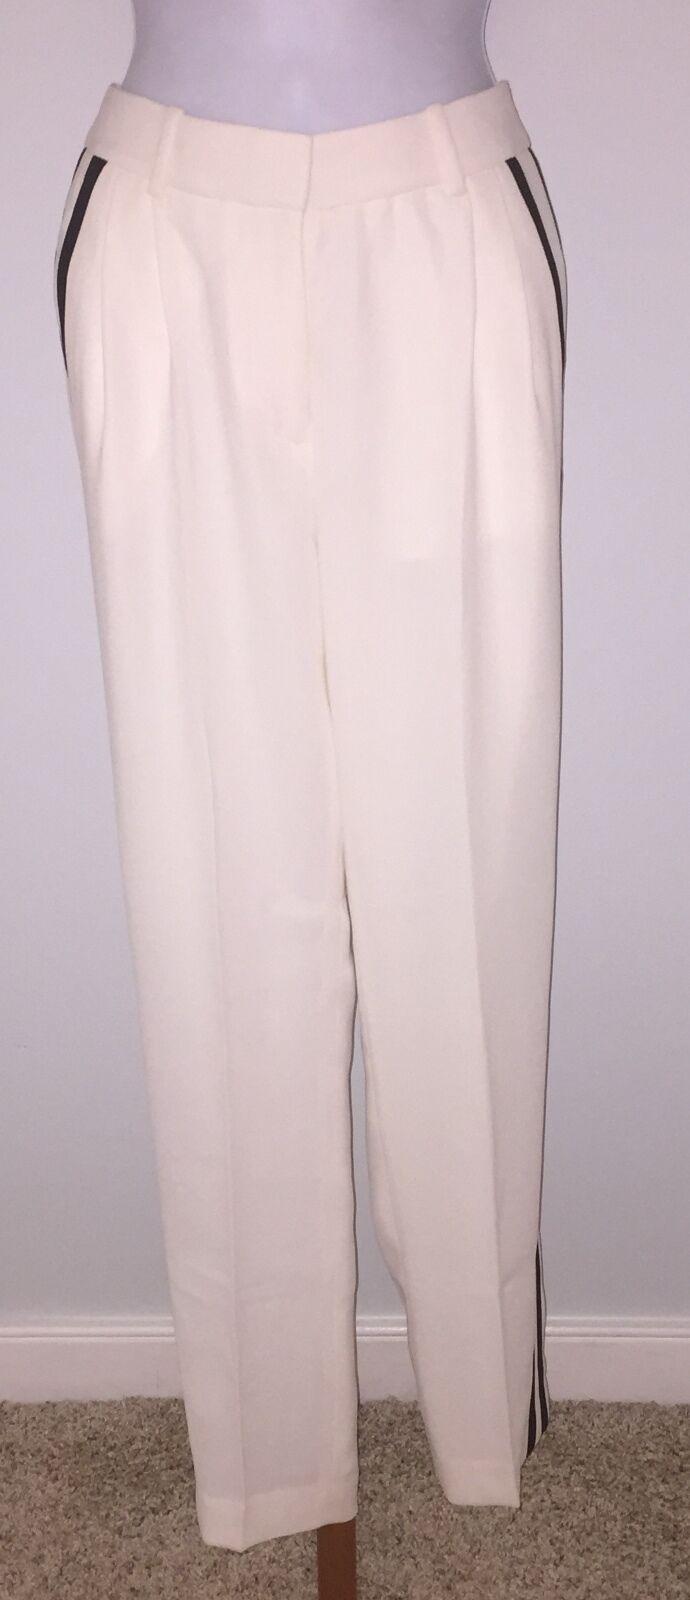 J CREW Collection Tuxedo Pant Size 00 Ivory  b6461  158